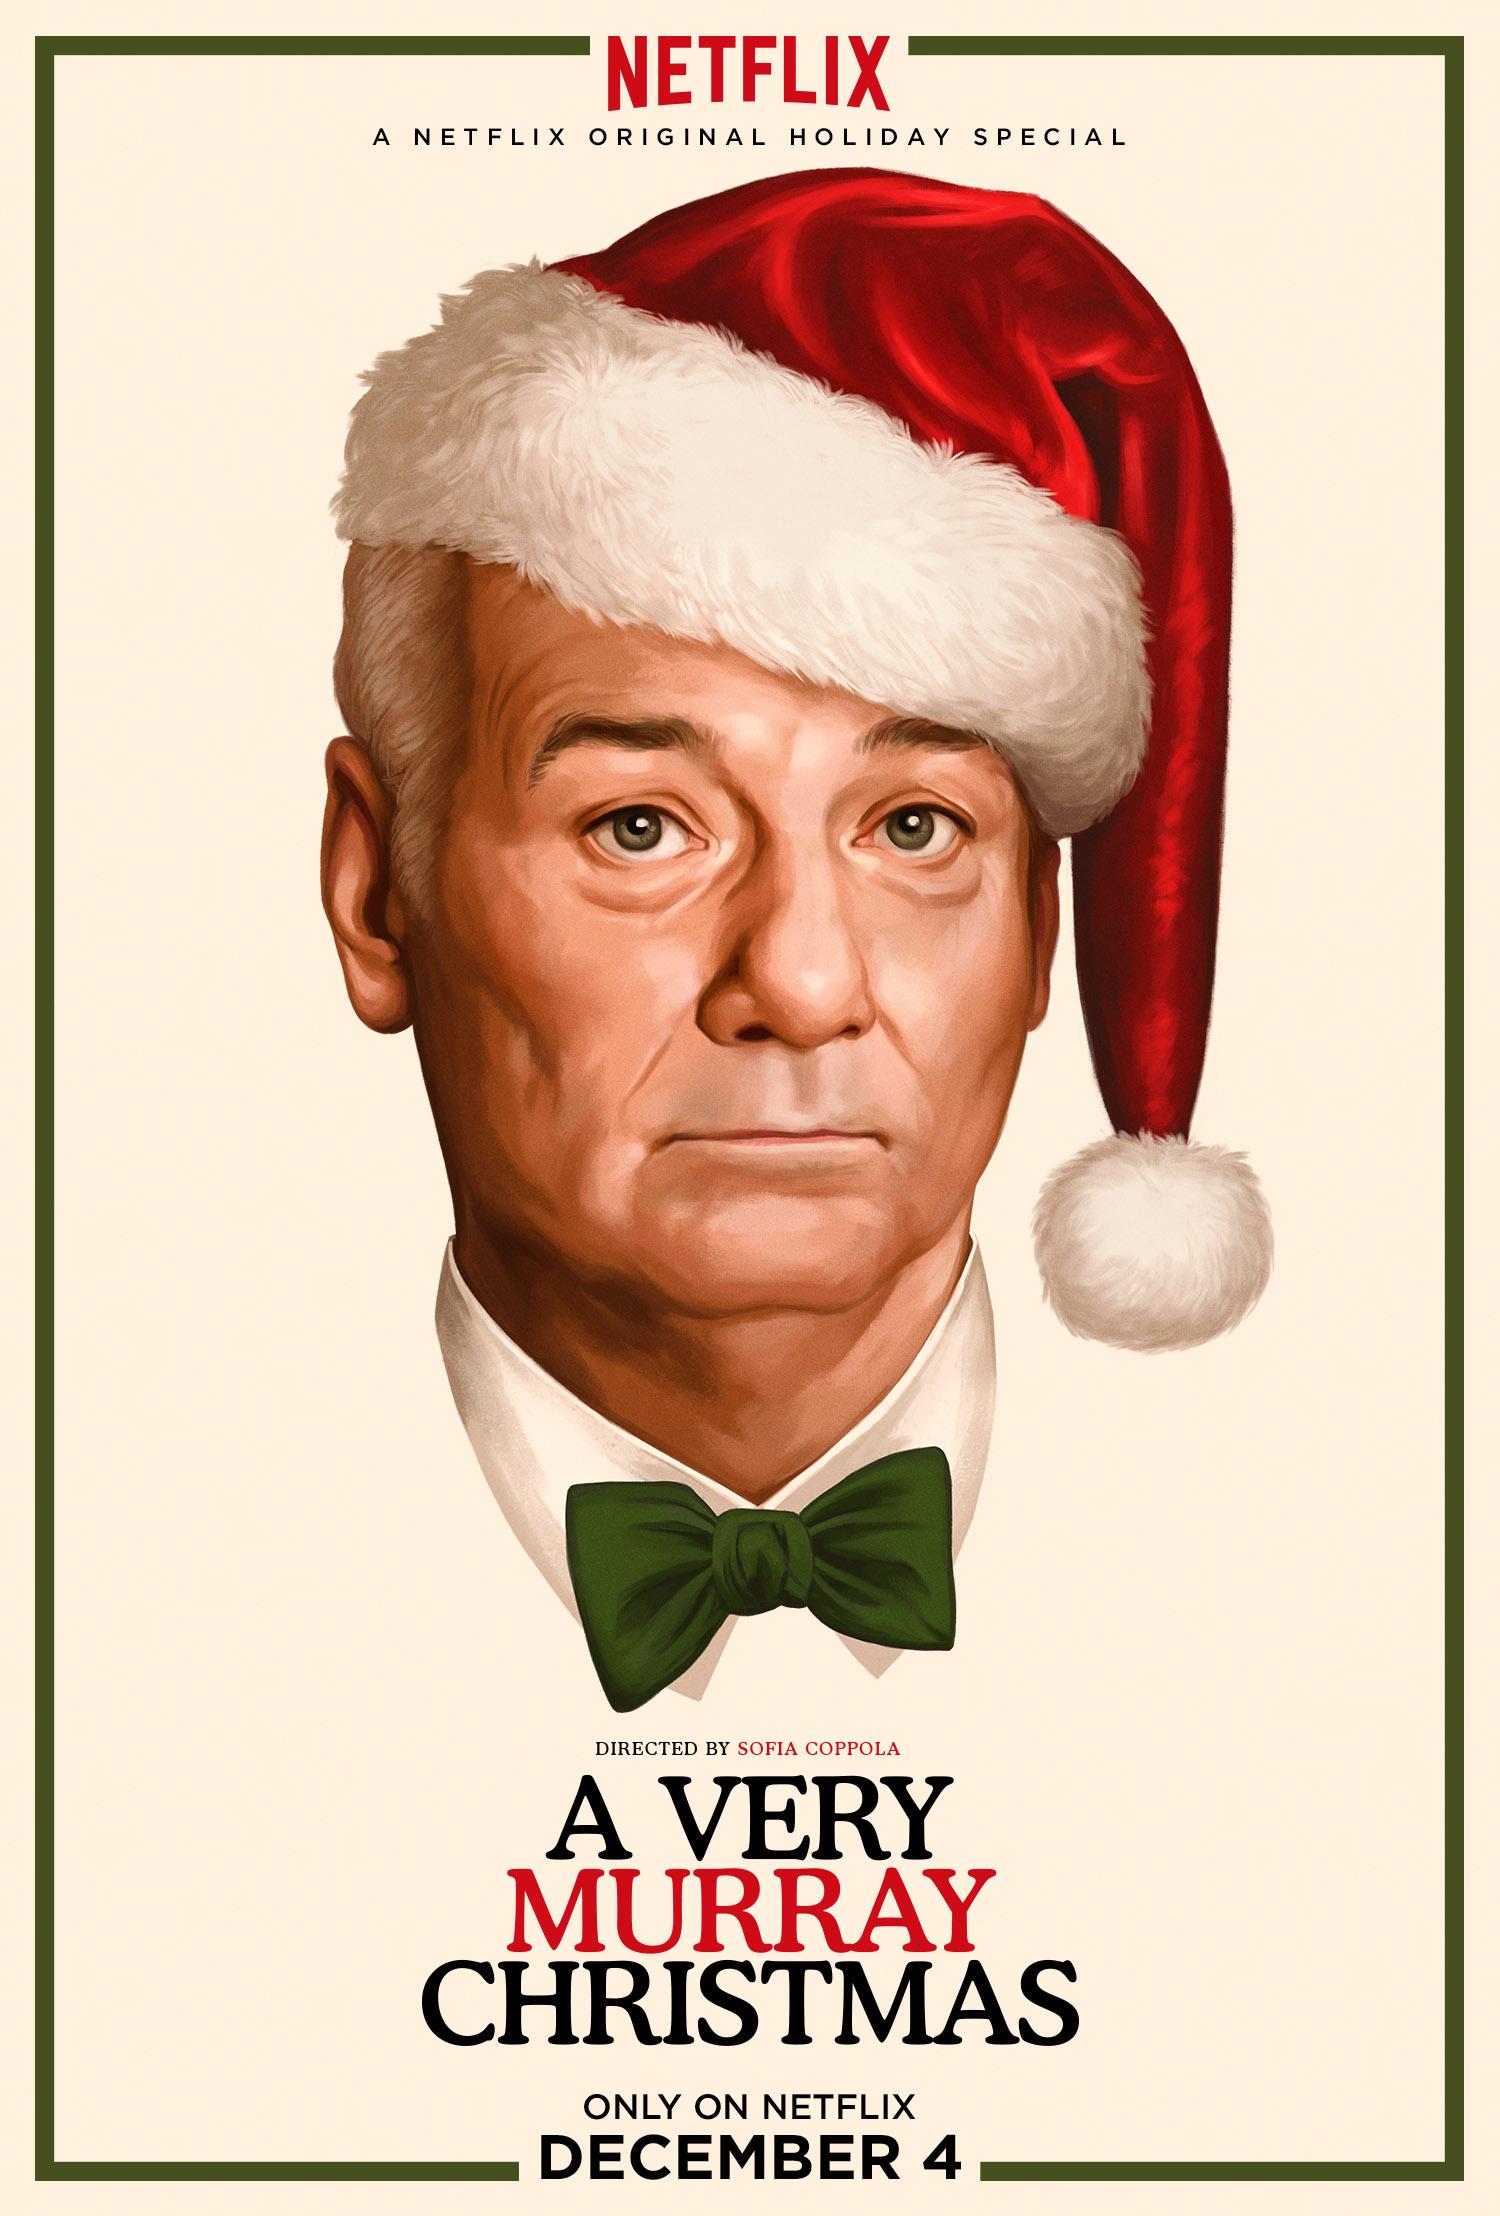 ...a very murray christmas poster art, done by Alex Osborn...